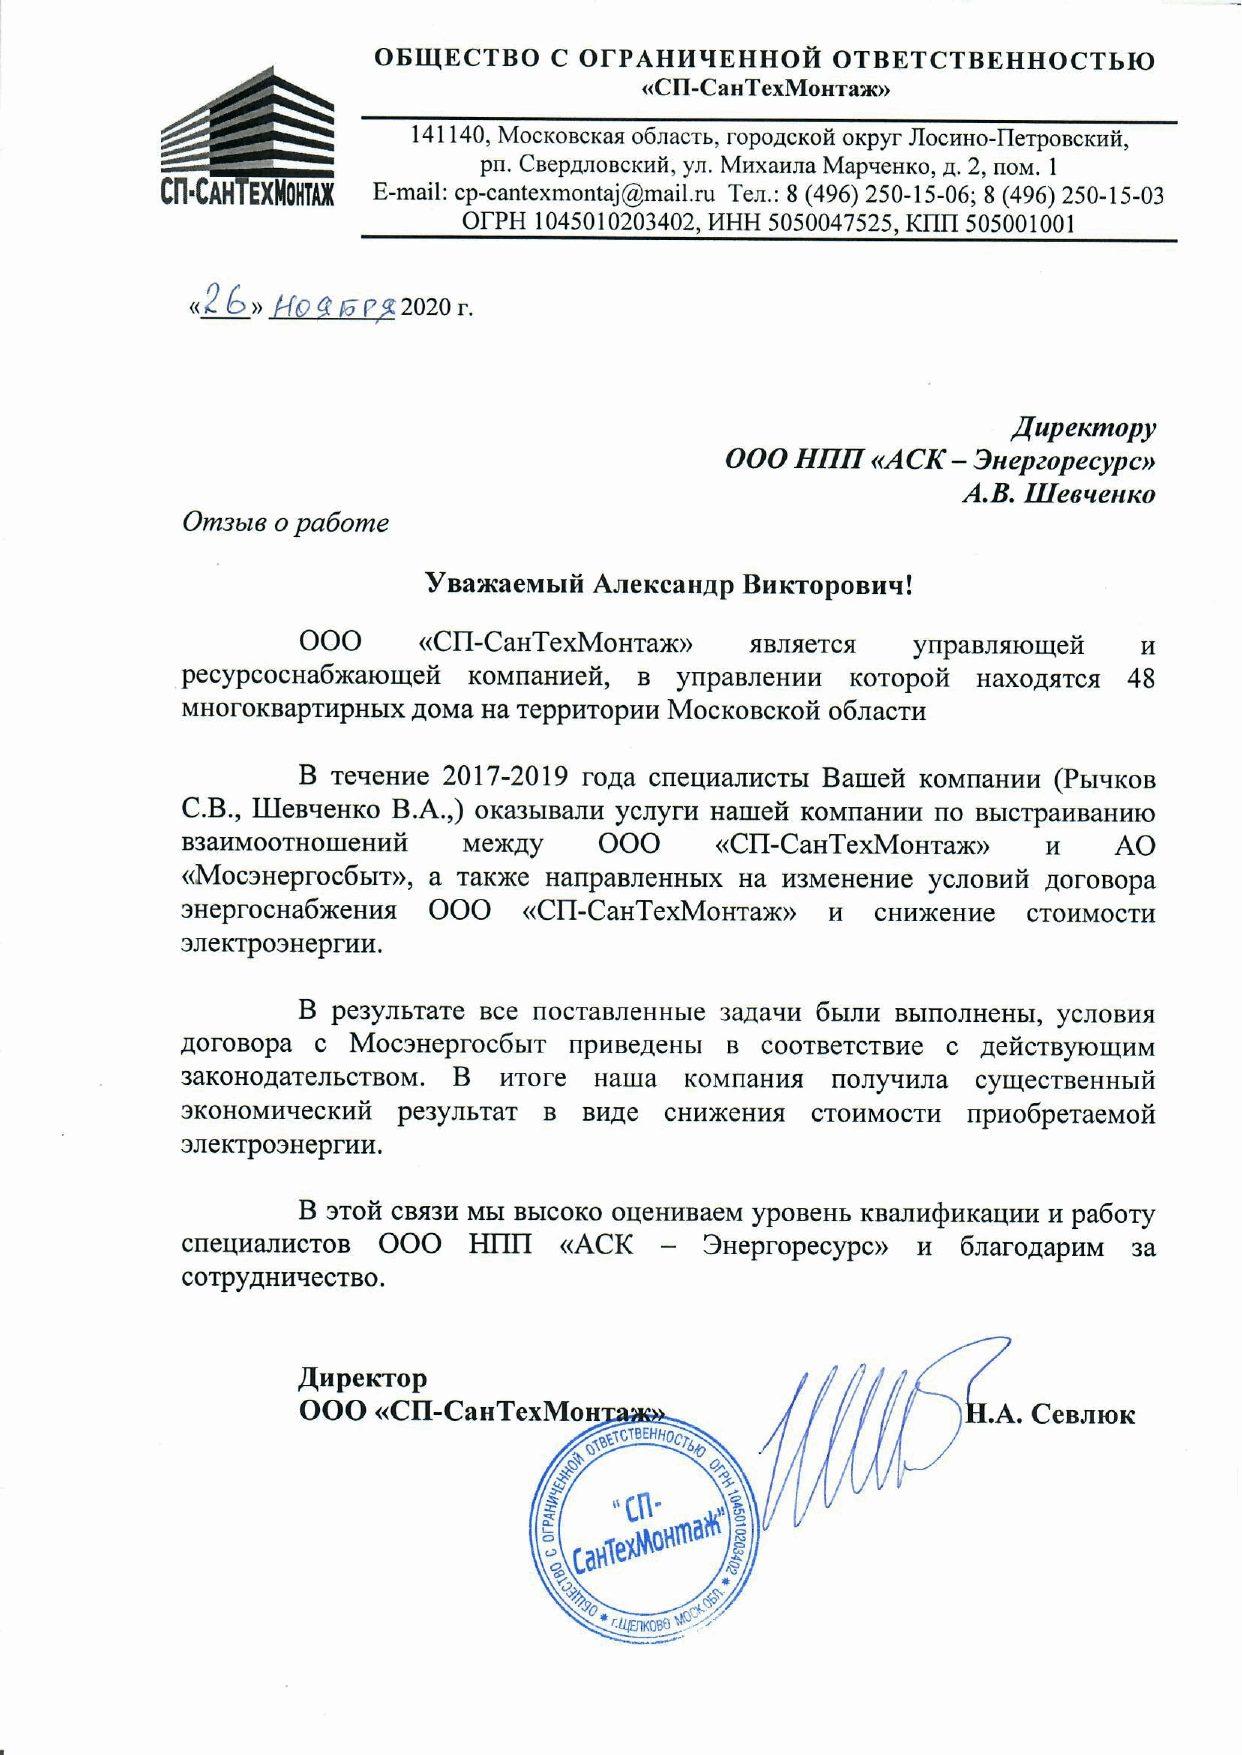 Отзыв СанТехМонтаж